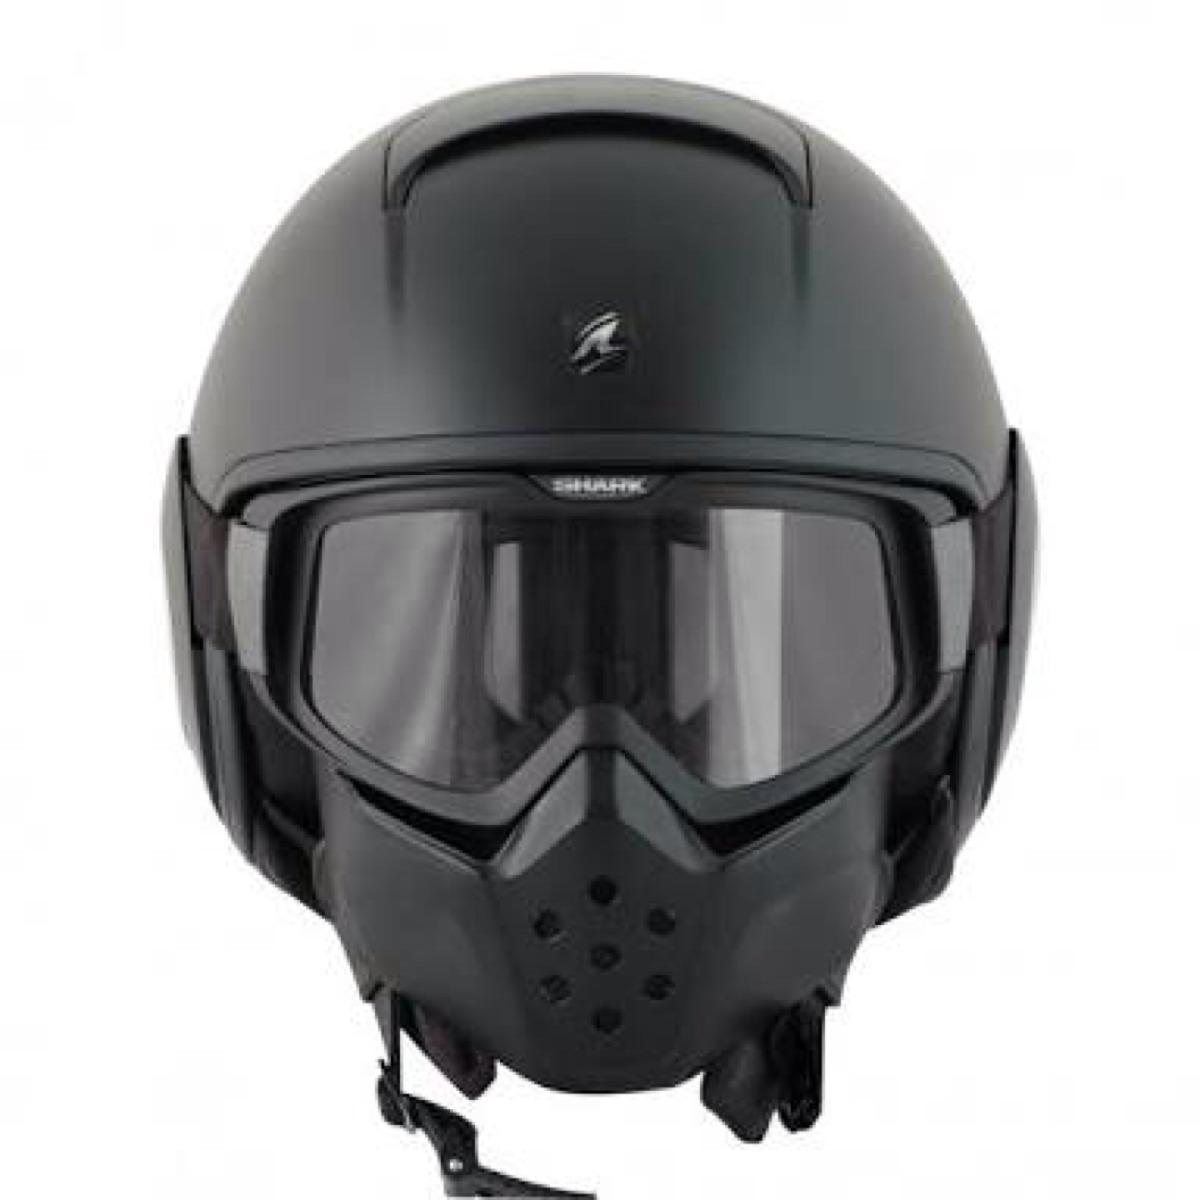 casco para moto shark raw 6 en mercado libre. Black Bedroom Furniture Sets. Home Design Ideas